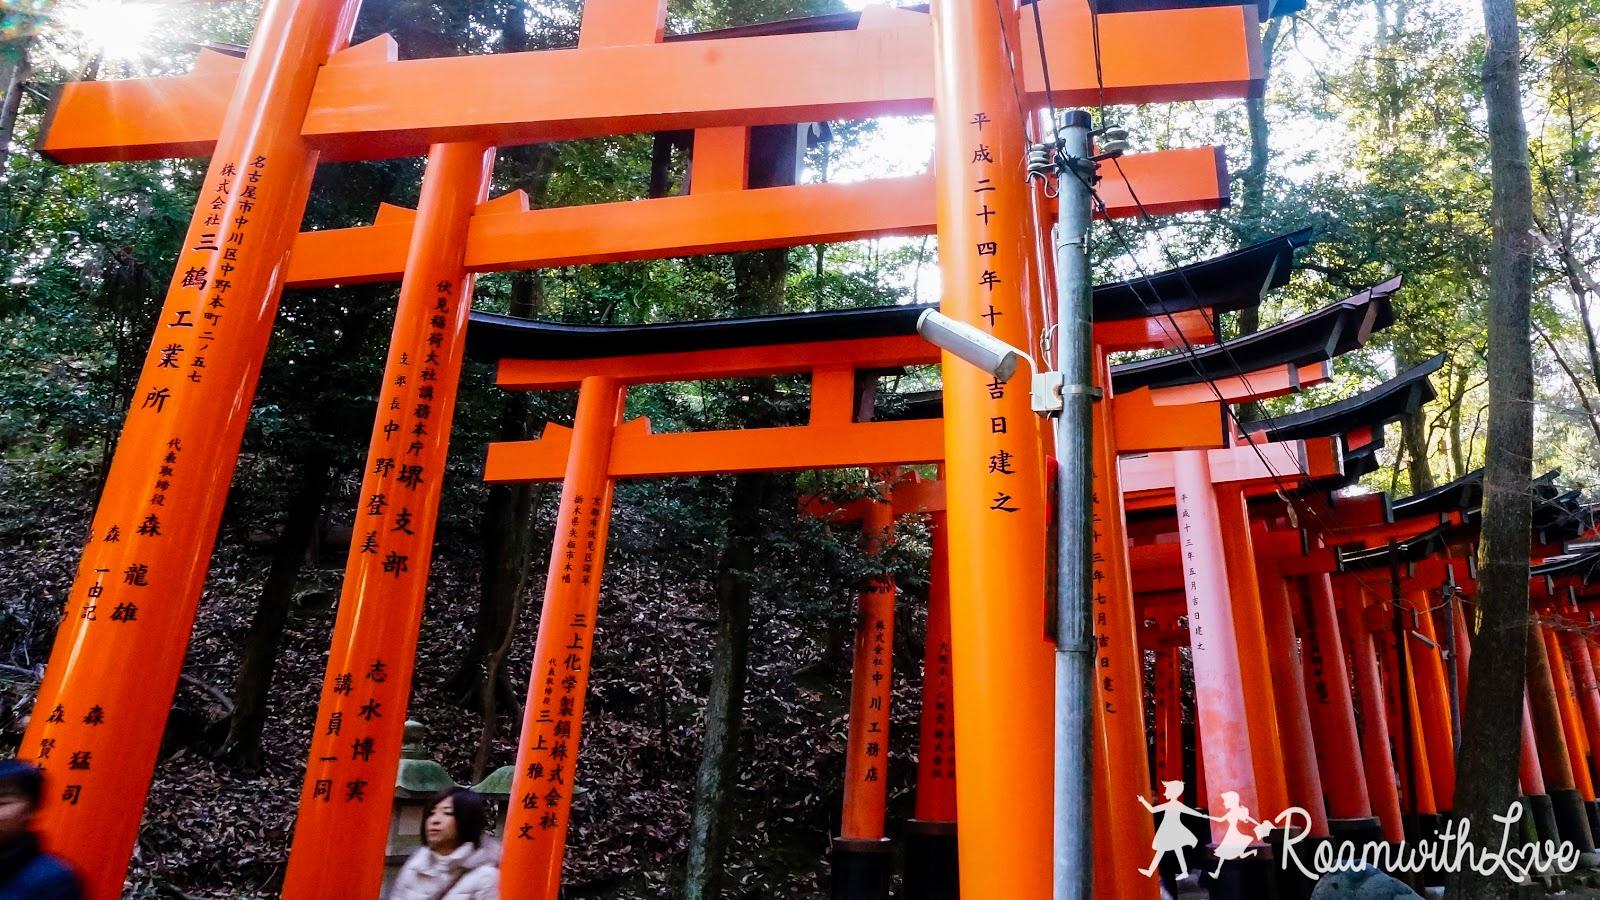 Japan,kyoto,review,เกีนวโต,รีวิว,ทริป,สวีท,ญี่ปุ่น,คันไซ,inari,fushimi,ฟูชิมิ อินาริ